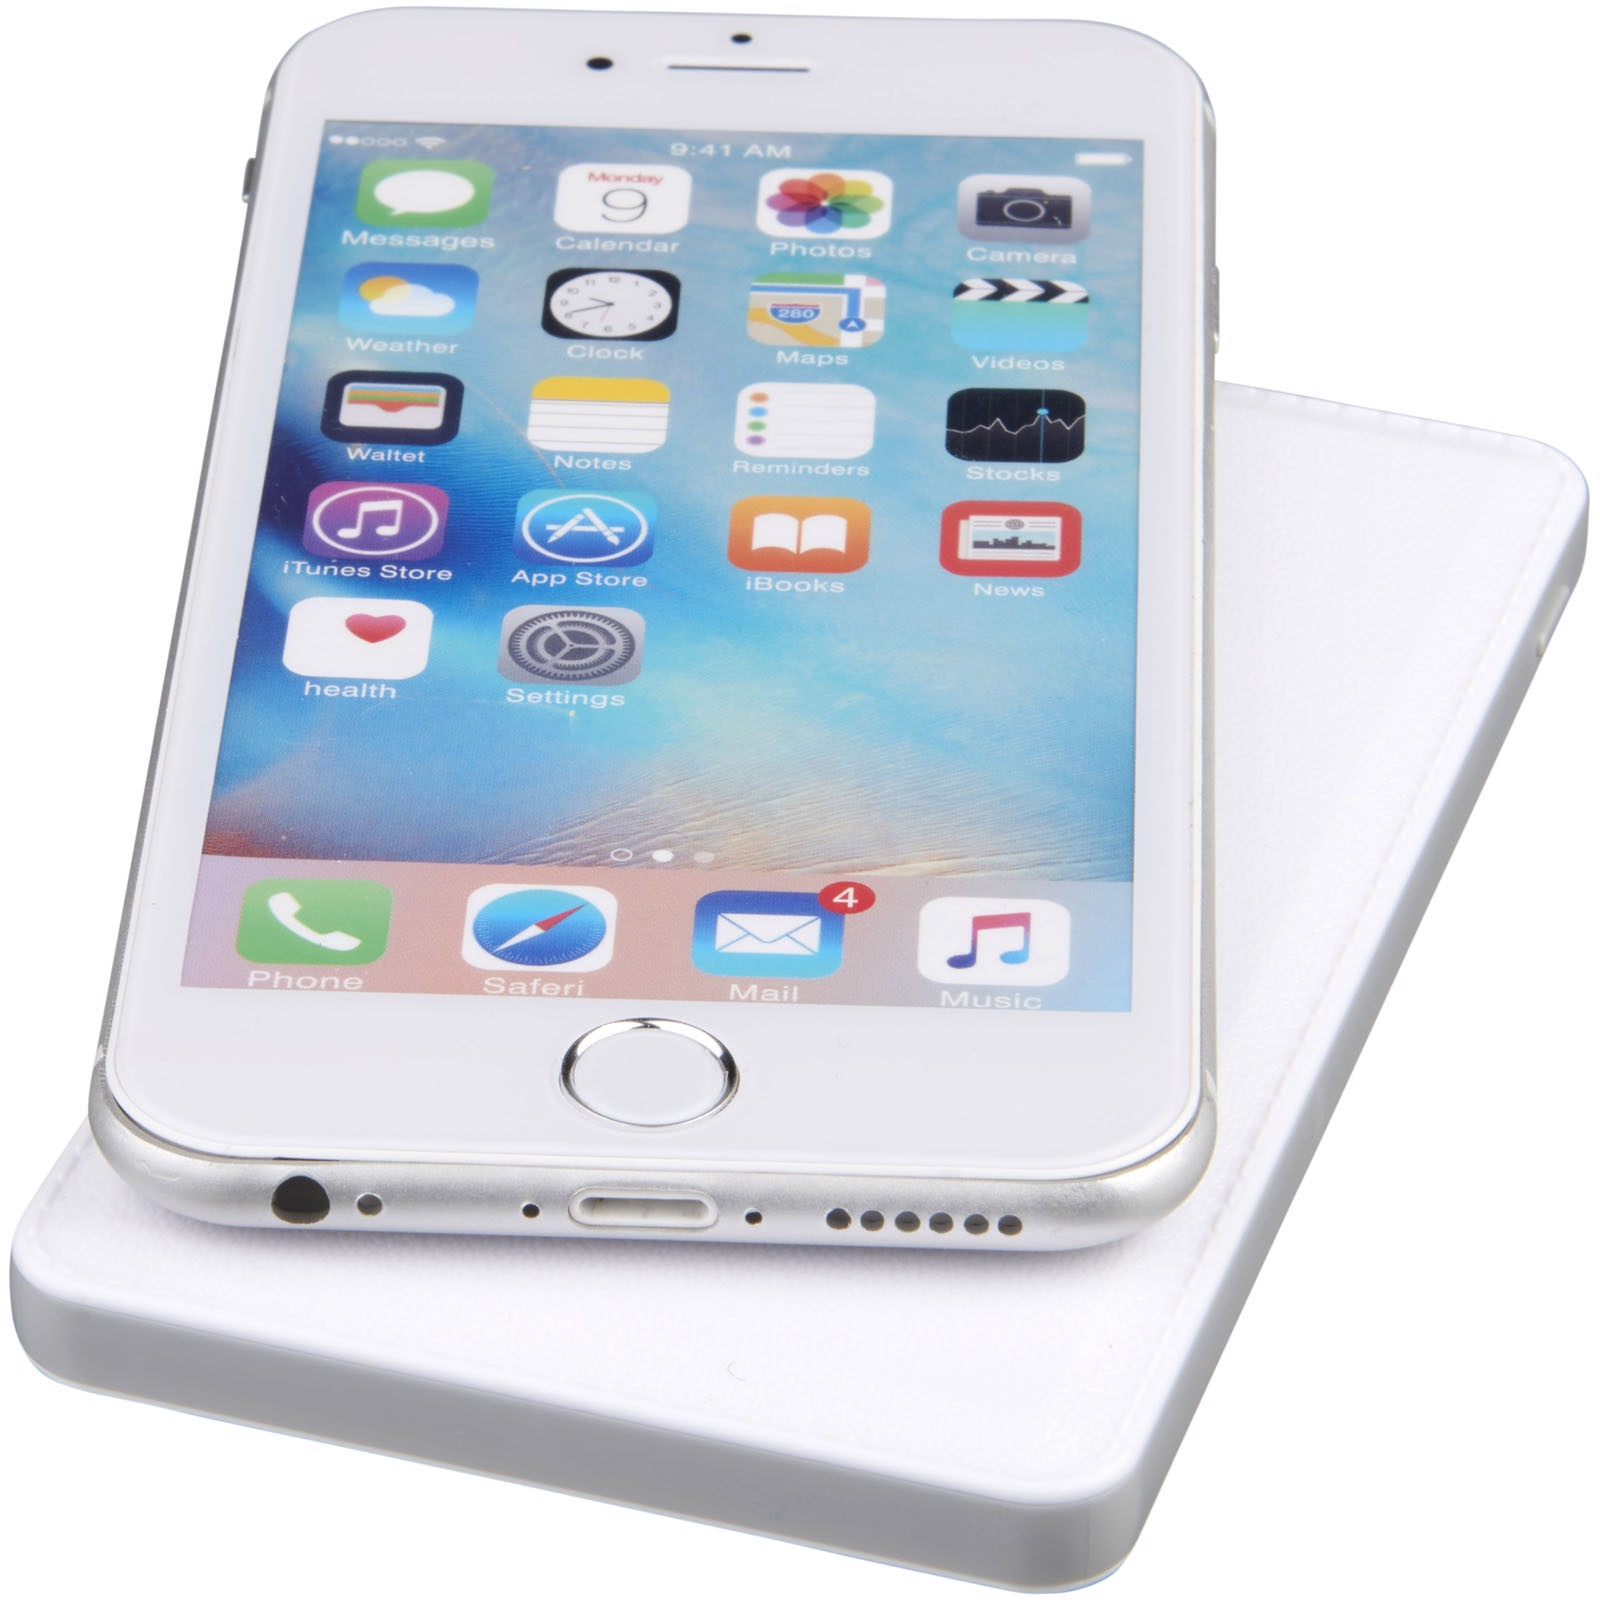 Phase 3000 mAh wireless power bank - White